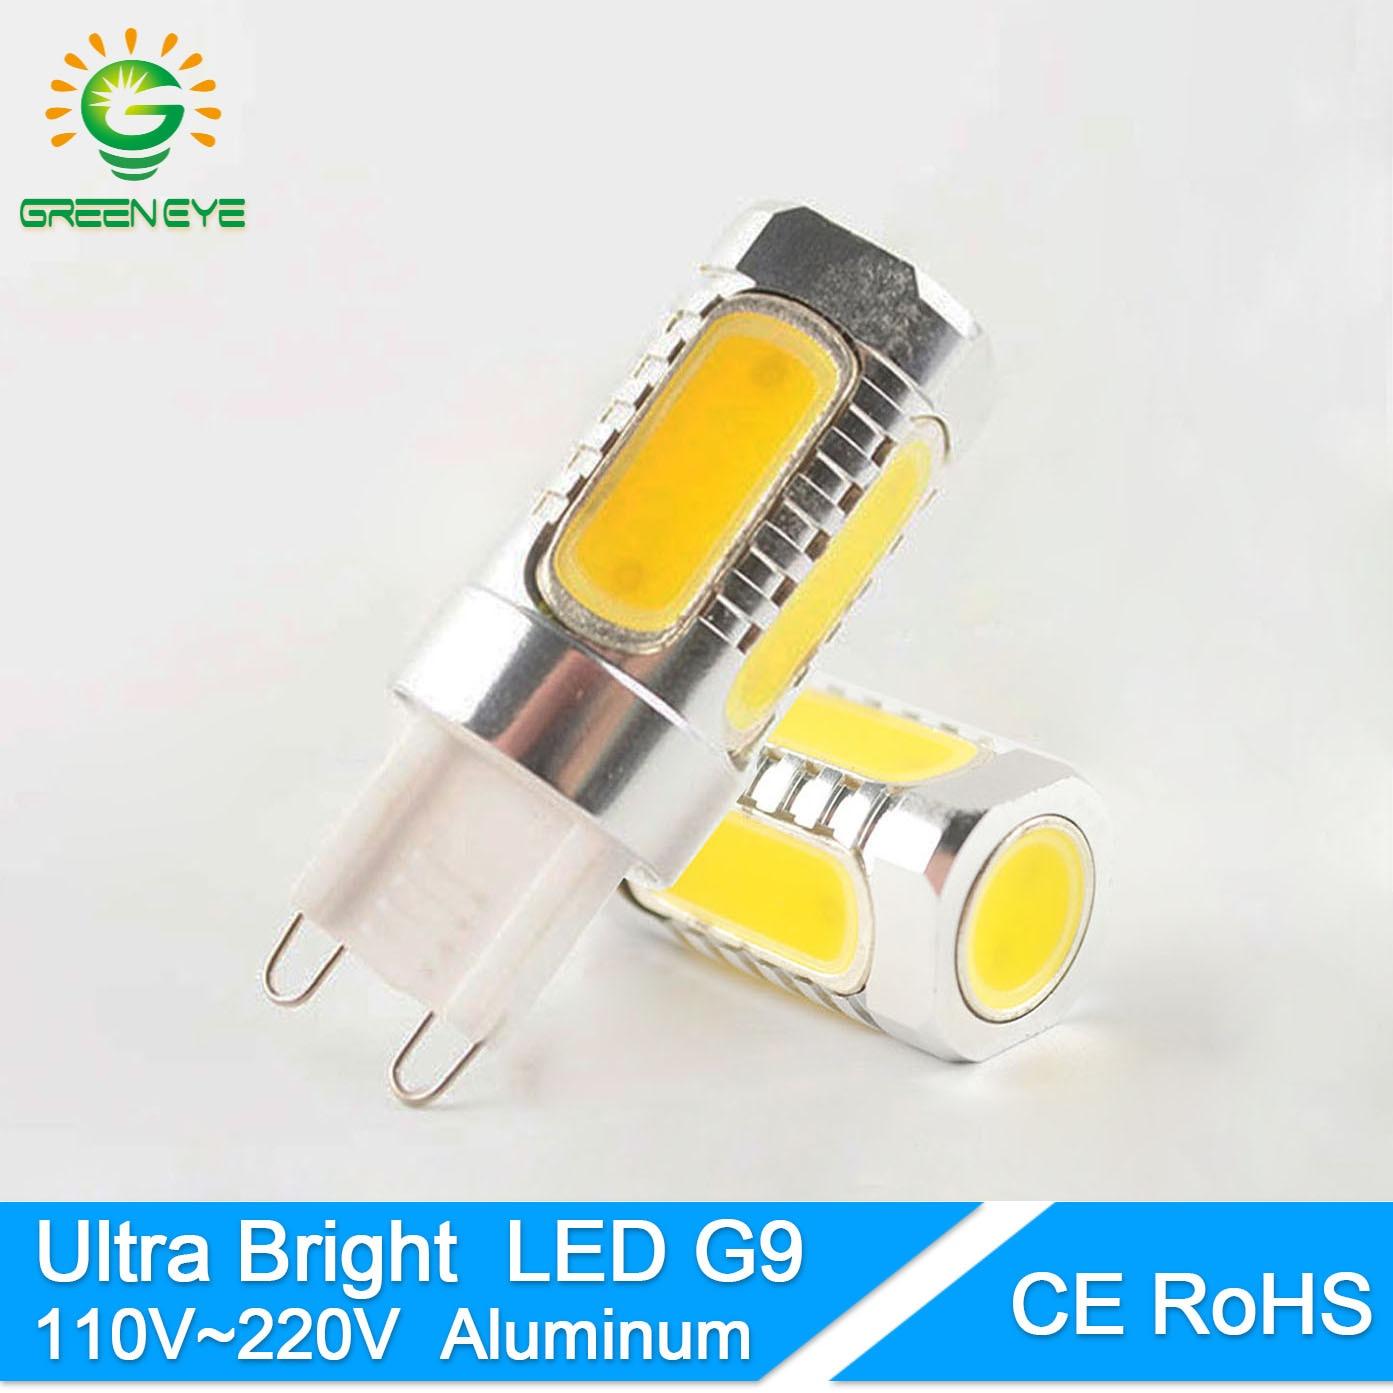 GreenEye-Aluminum-G9-font-b-LED-b-font-Light-12W-110V-220V-COB-font-b-LED Verwunderlich Gu 5.3 Led 230v Dekorationen